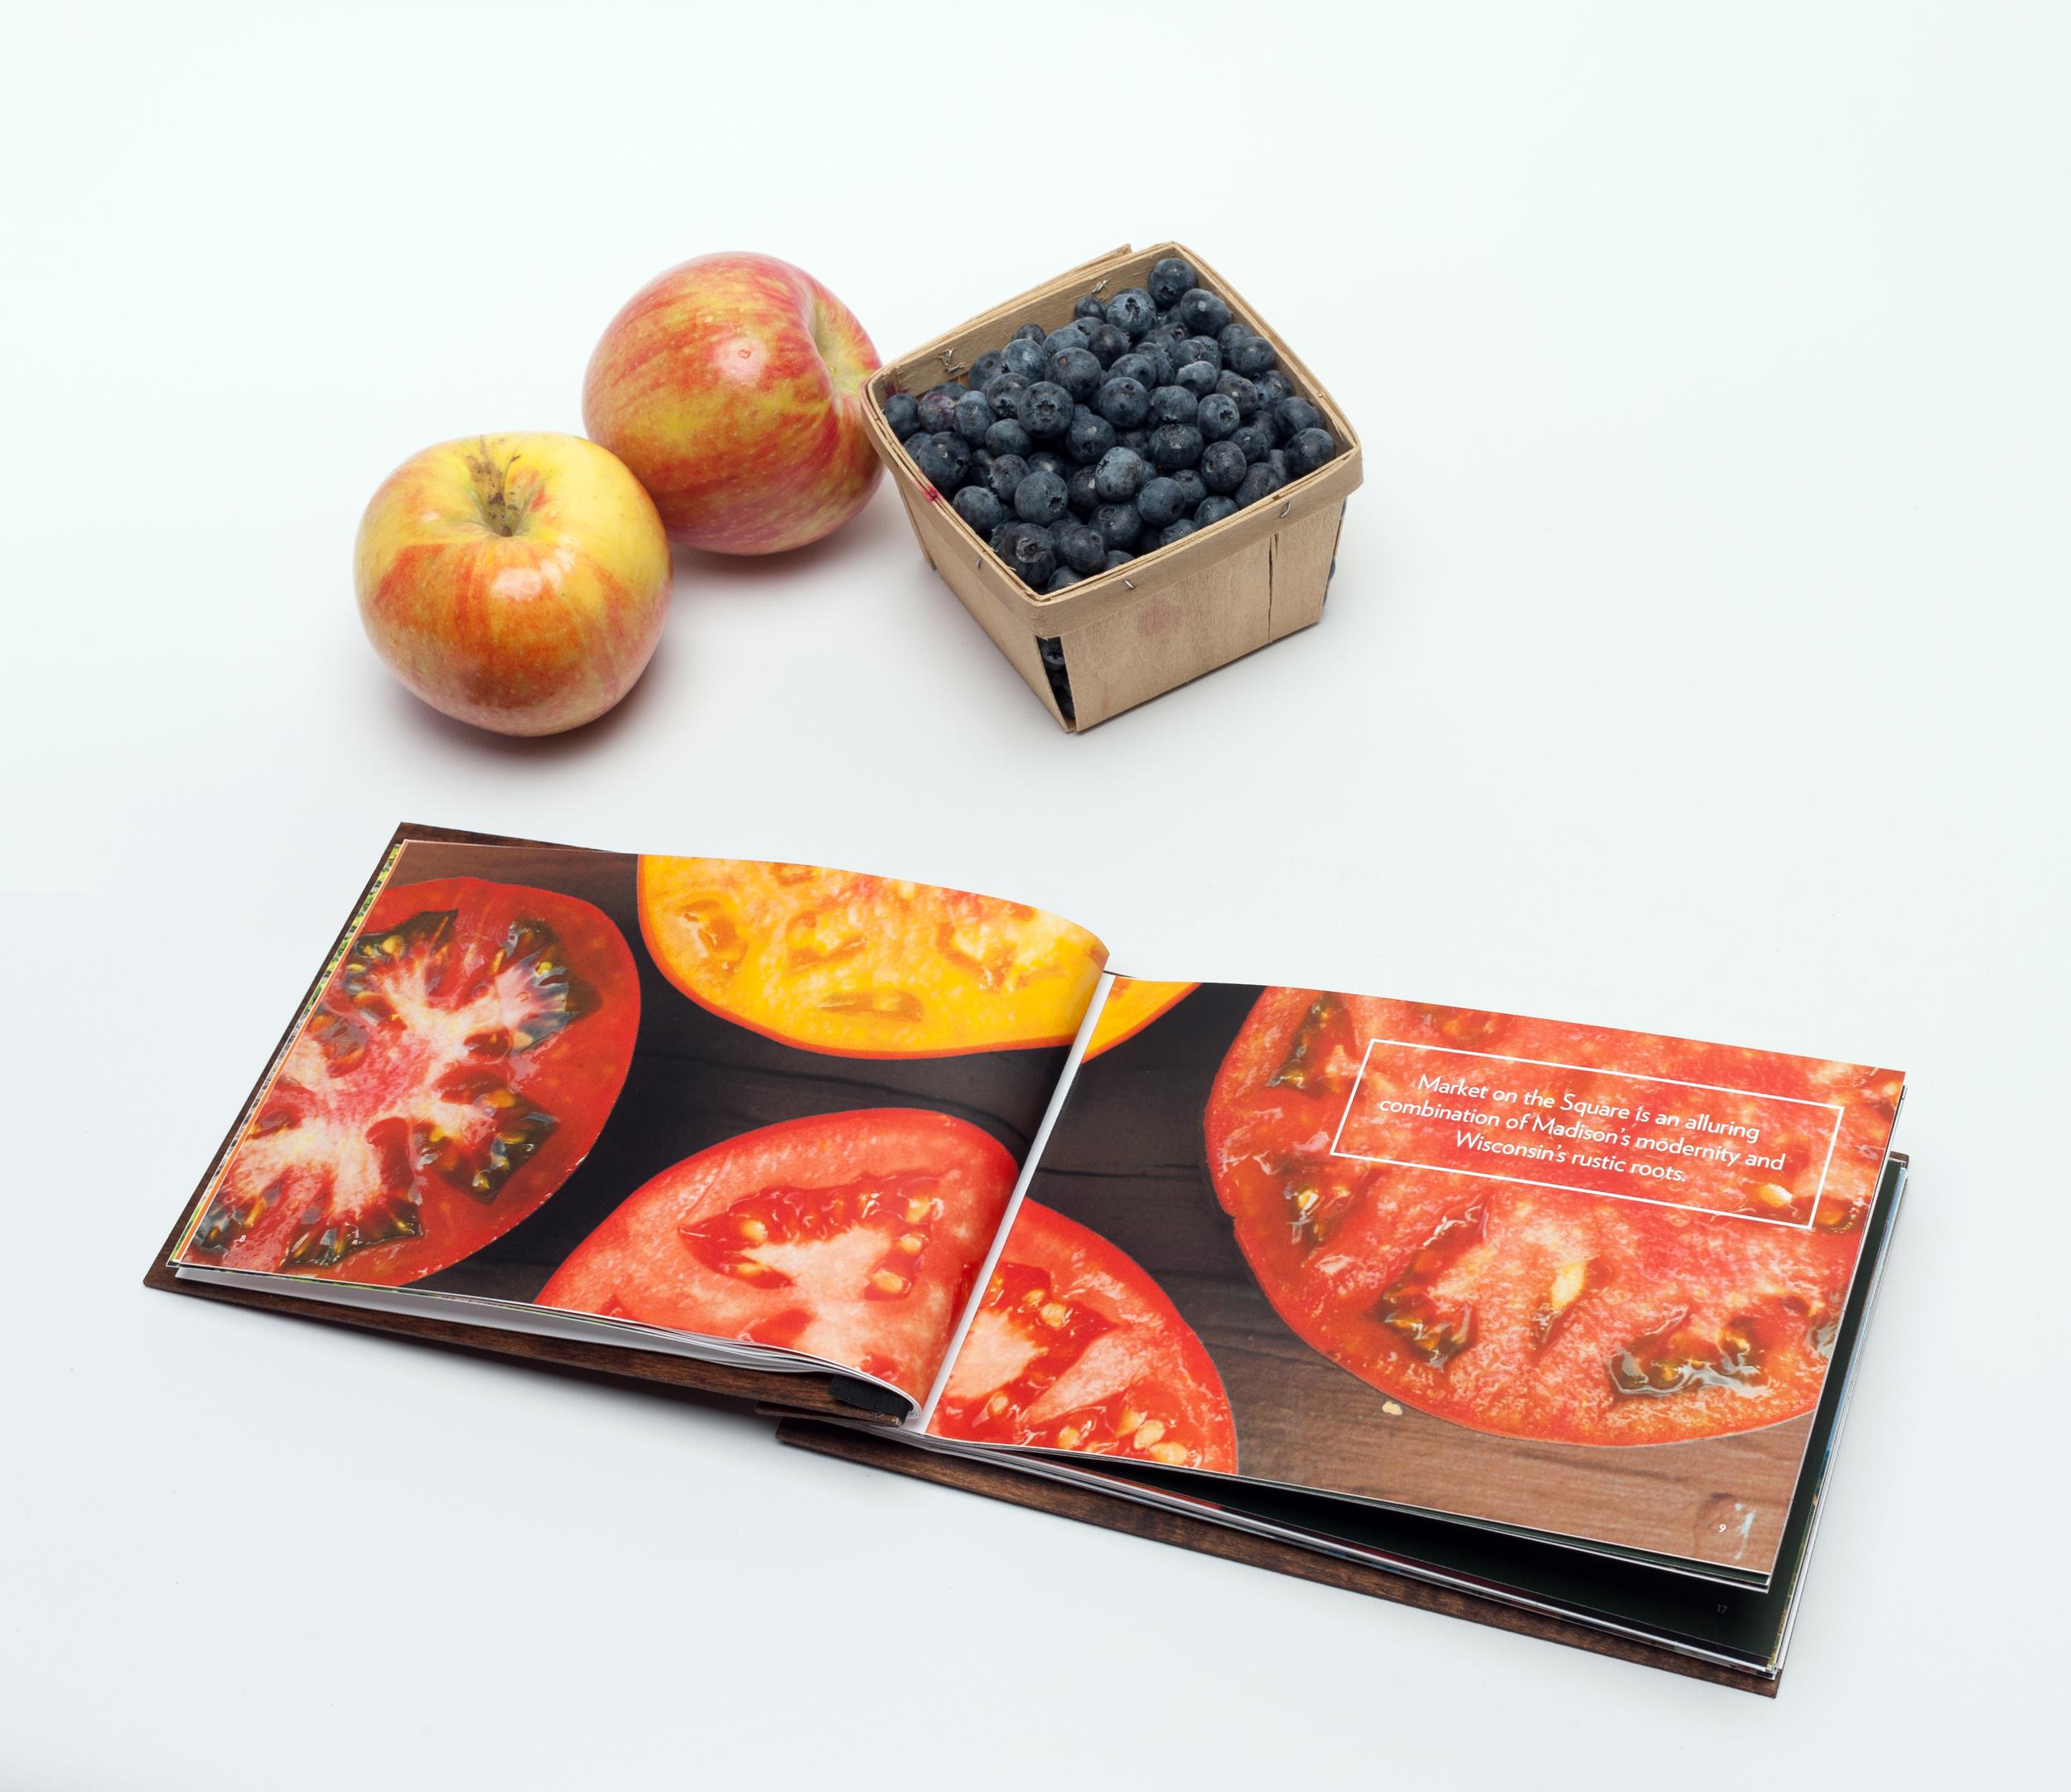 Market_tomatoesspread.jpg